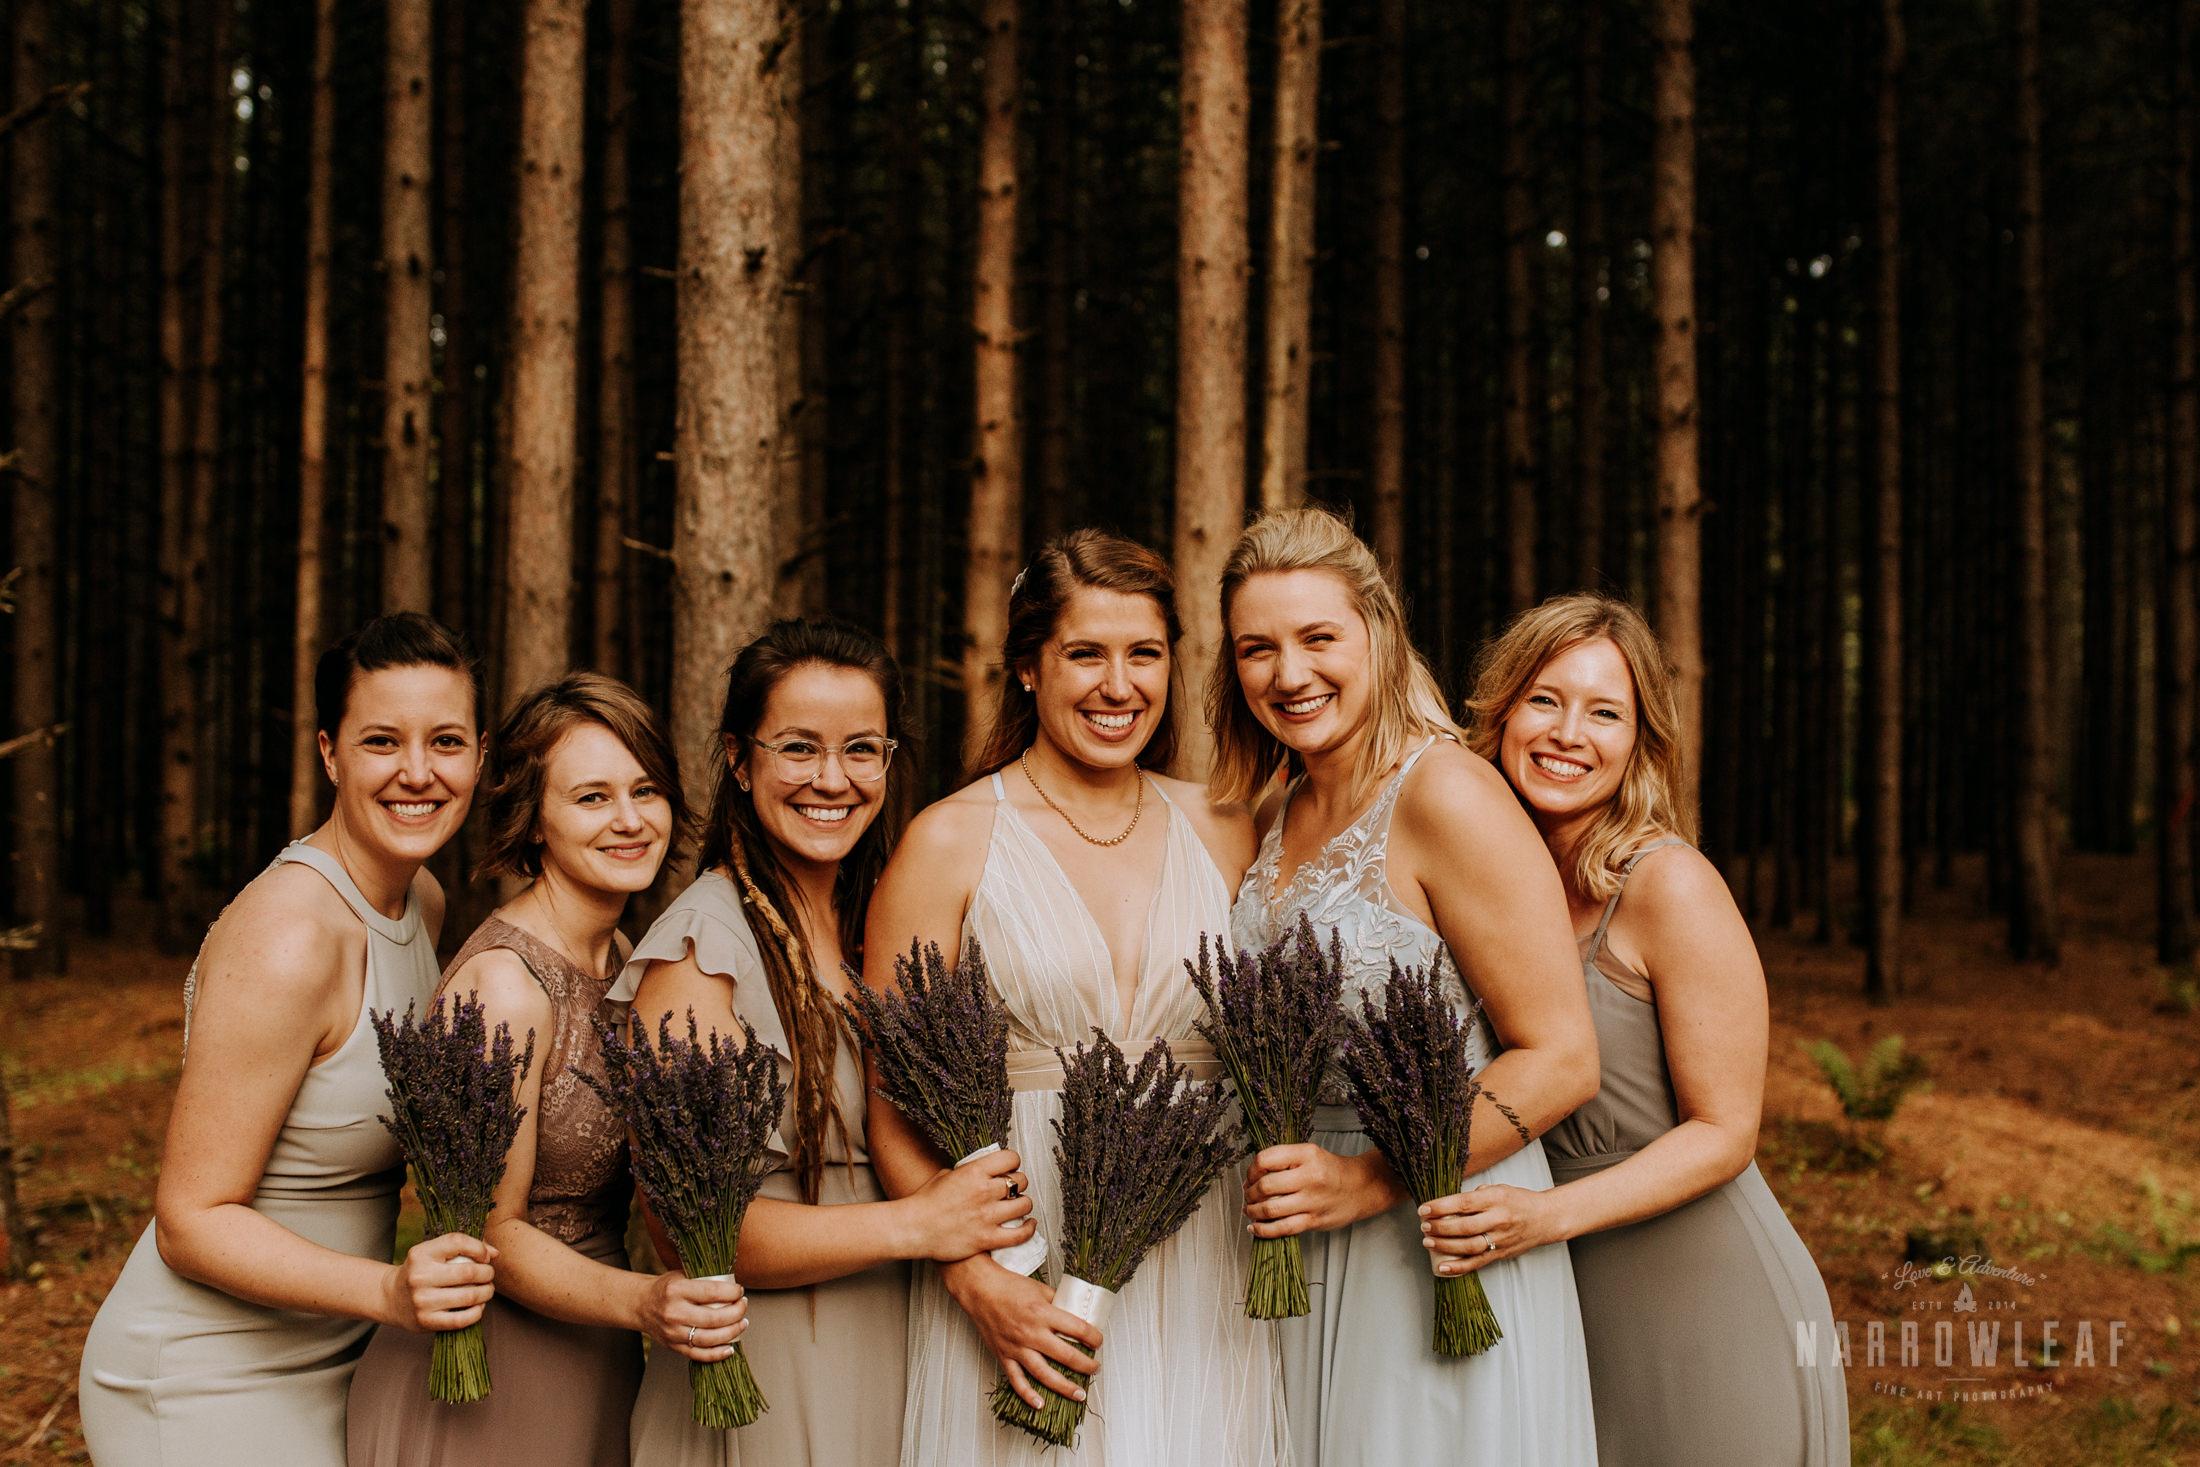 door-county-wedding-photographer-in-the-woods-Narrowleaf_Love_and_Adventure_Photography-9142.jpg